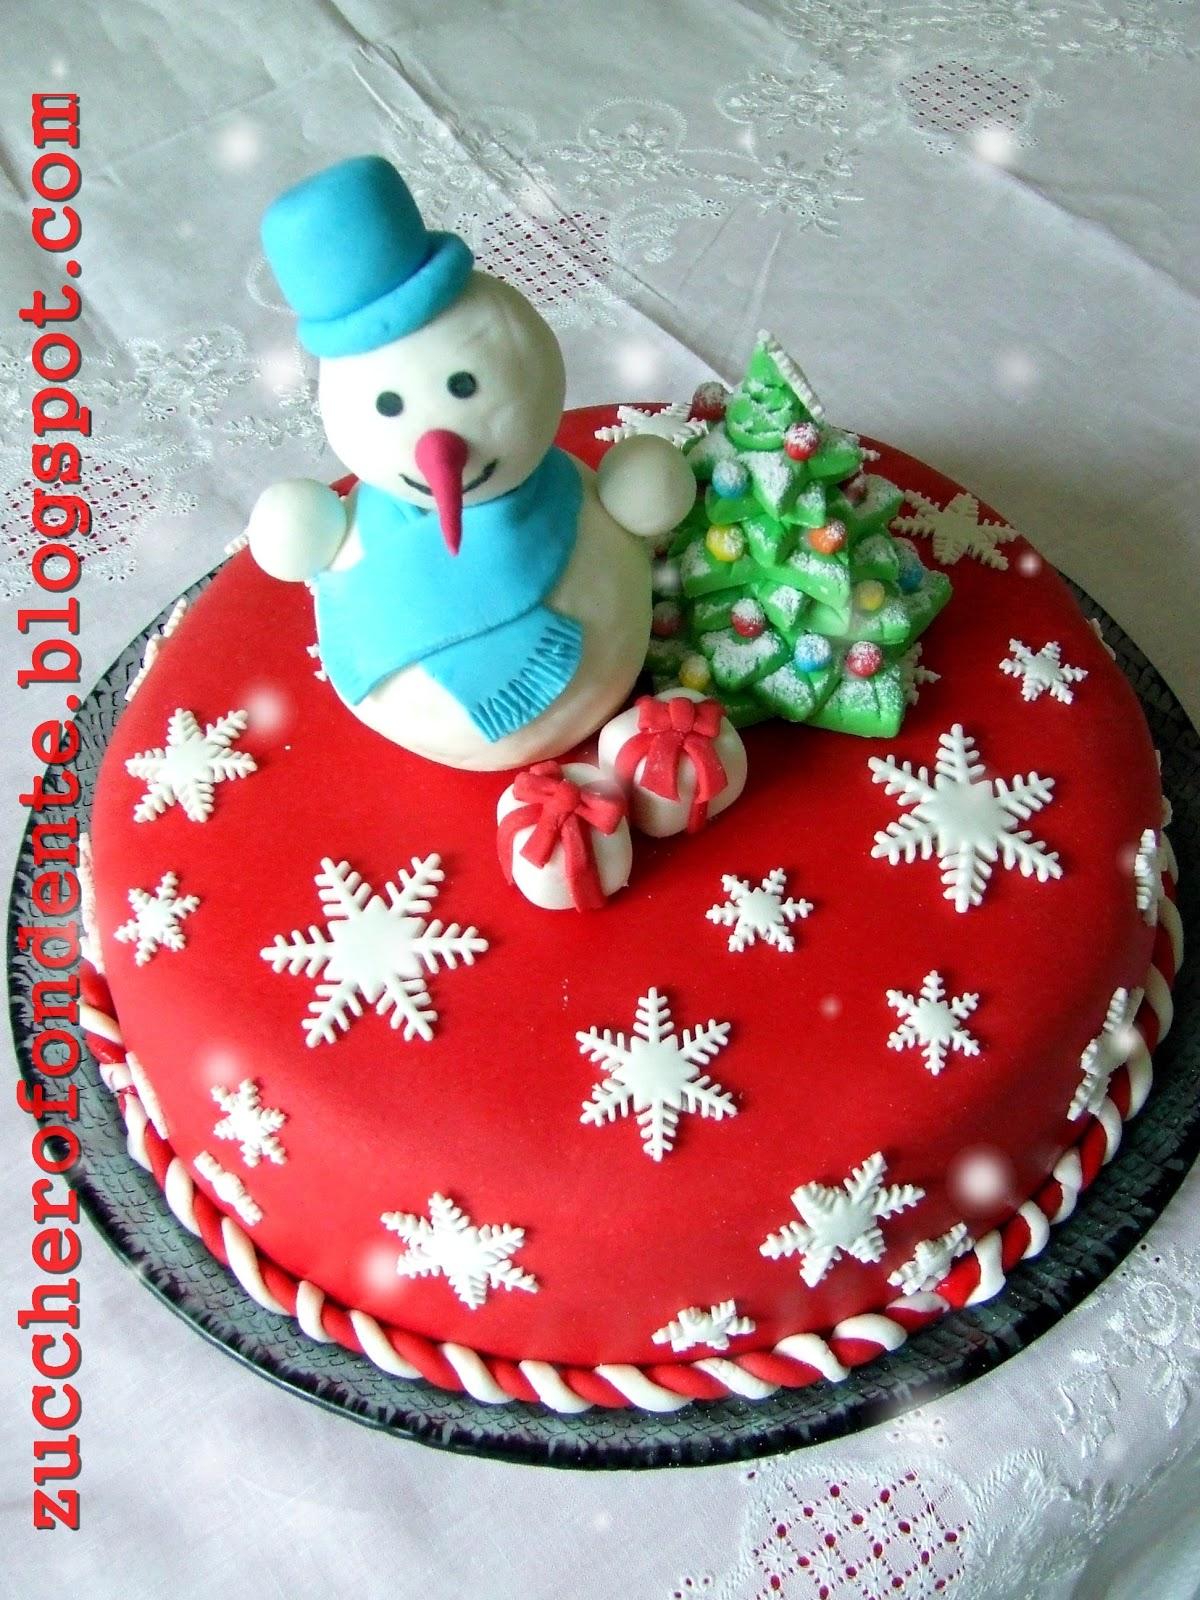 Zuccherofondente decorazioni natalizie in pasta di zucchero for Pasta di zucchero decorazioni